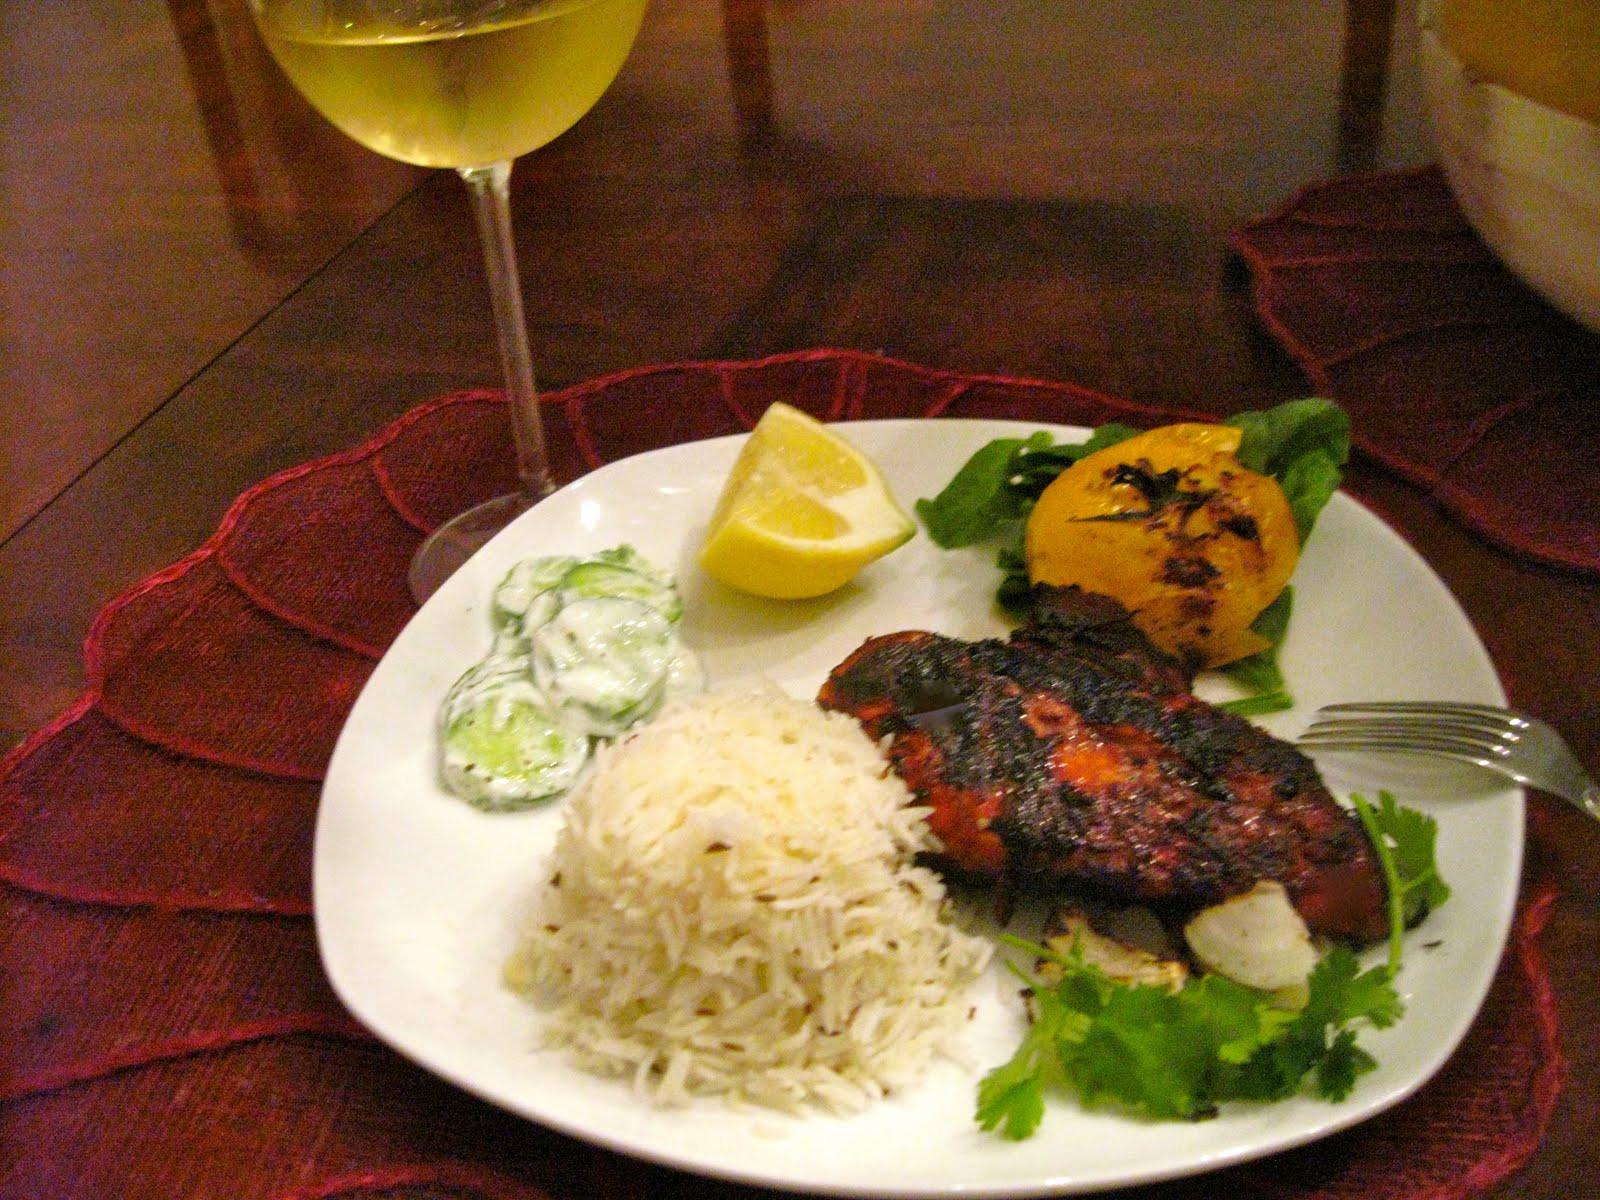 Tandoori Chicken Side Dishes  Classic Spicy Tandoori Chicken and side dishes